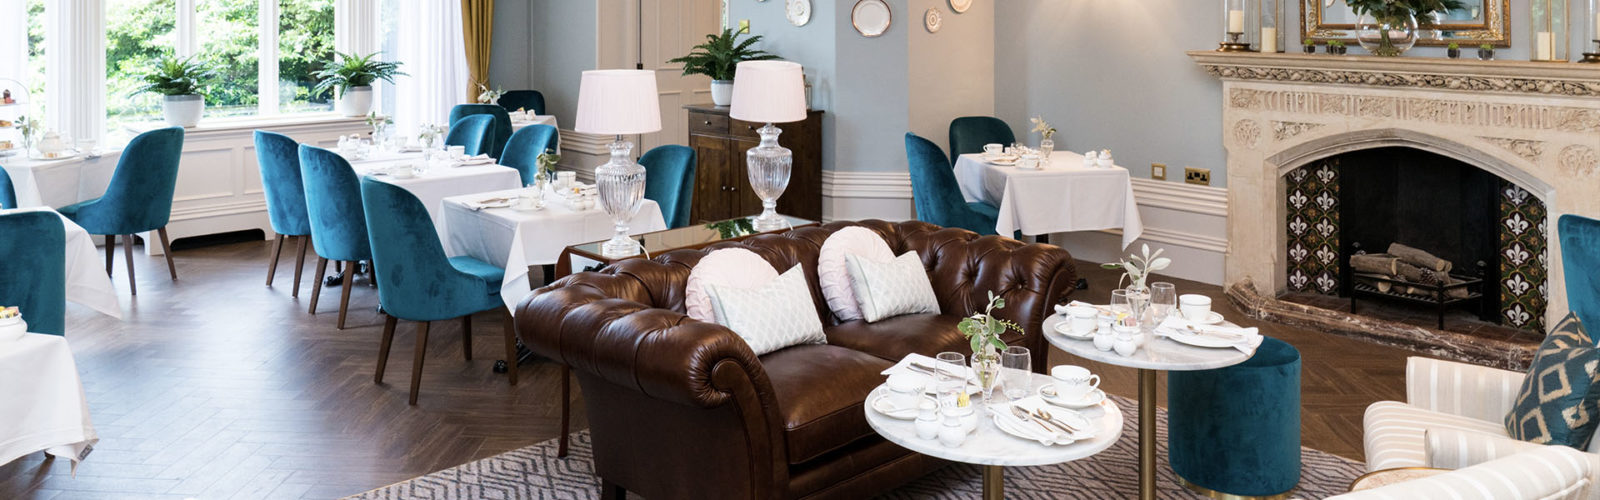 Laura Ashley The Tea Room at Kenwood Hall Vine Hotel Management